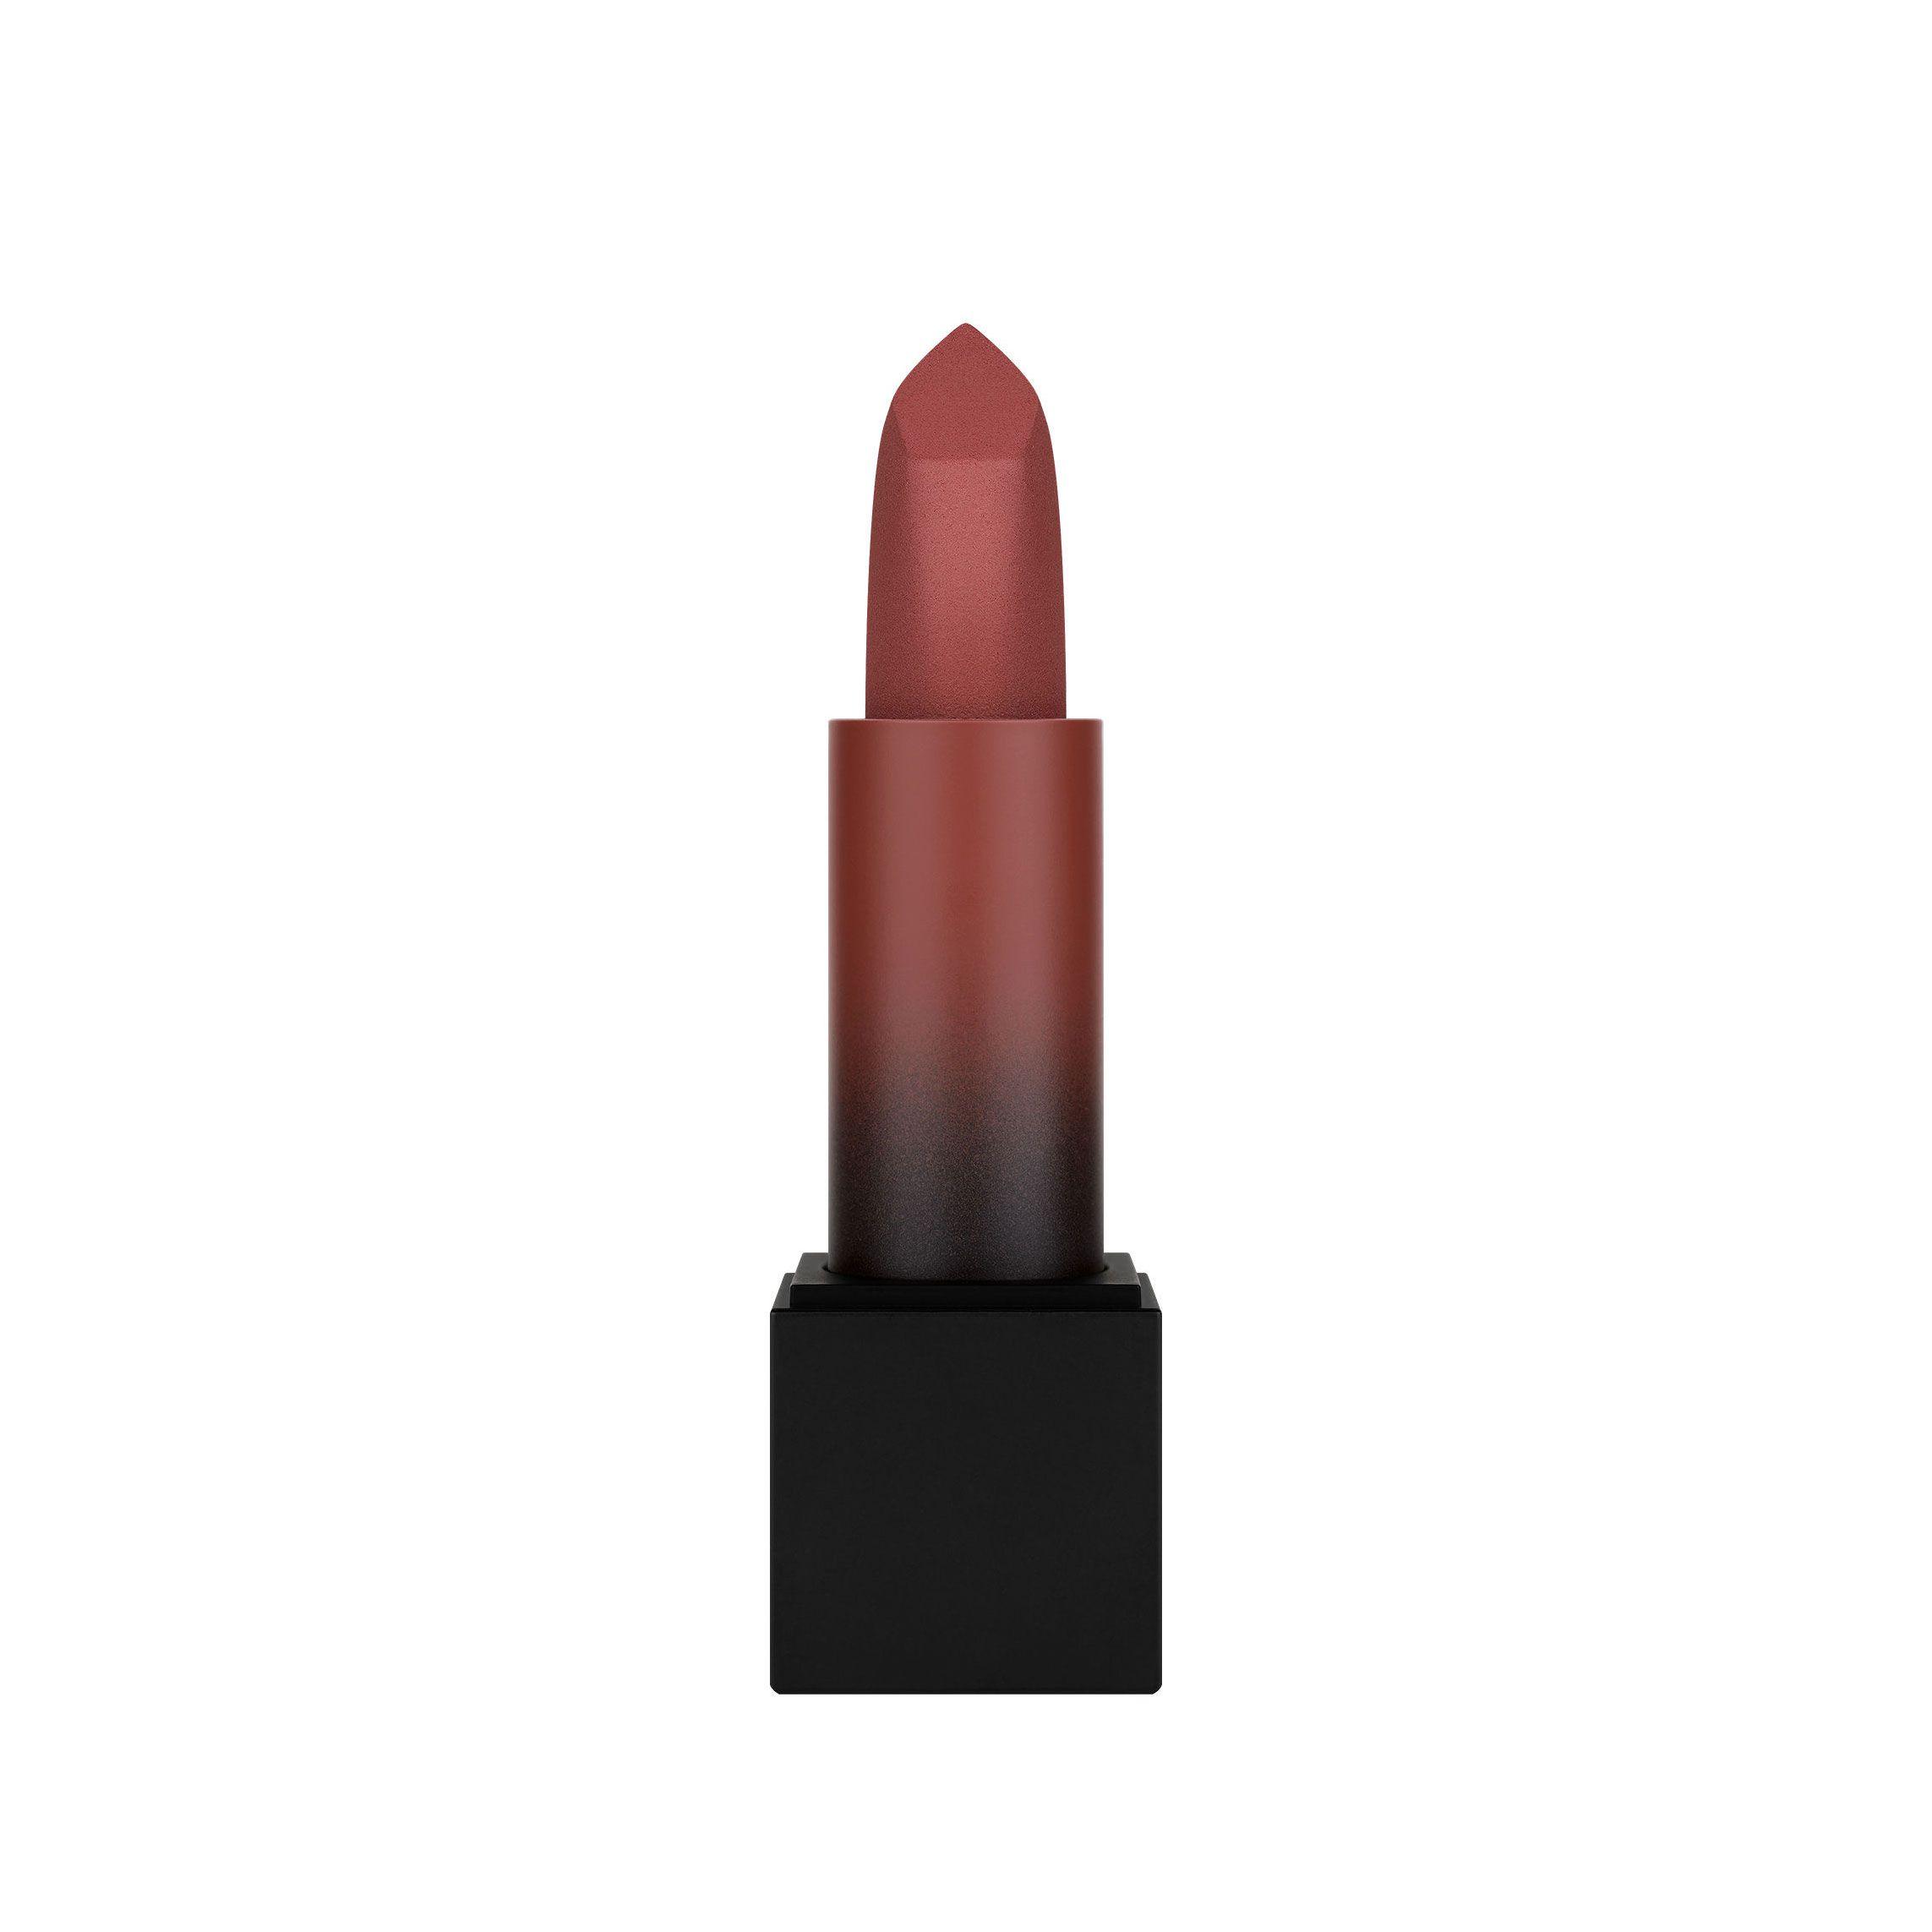 Power Bullet Matte Lipstick in Ladies Night